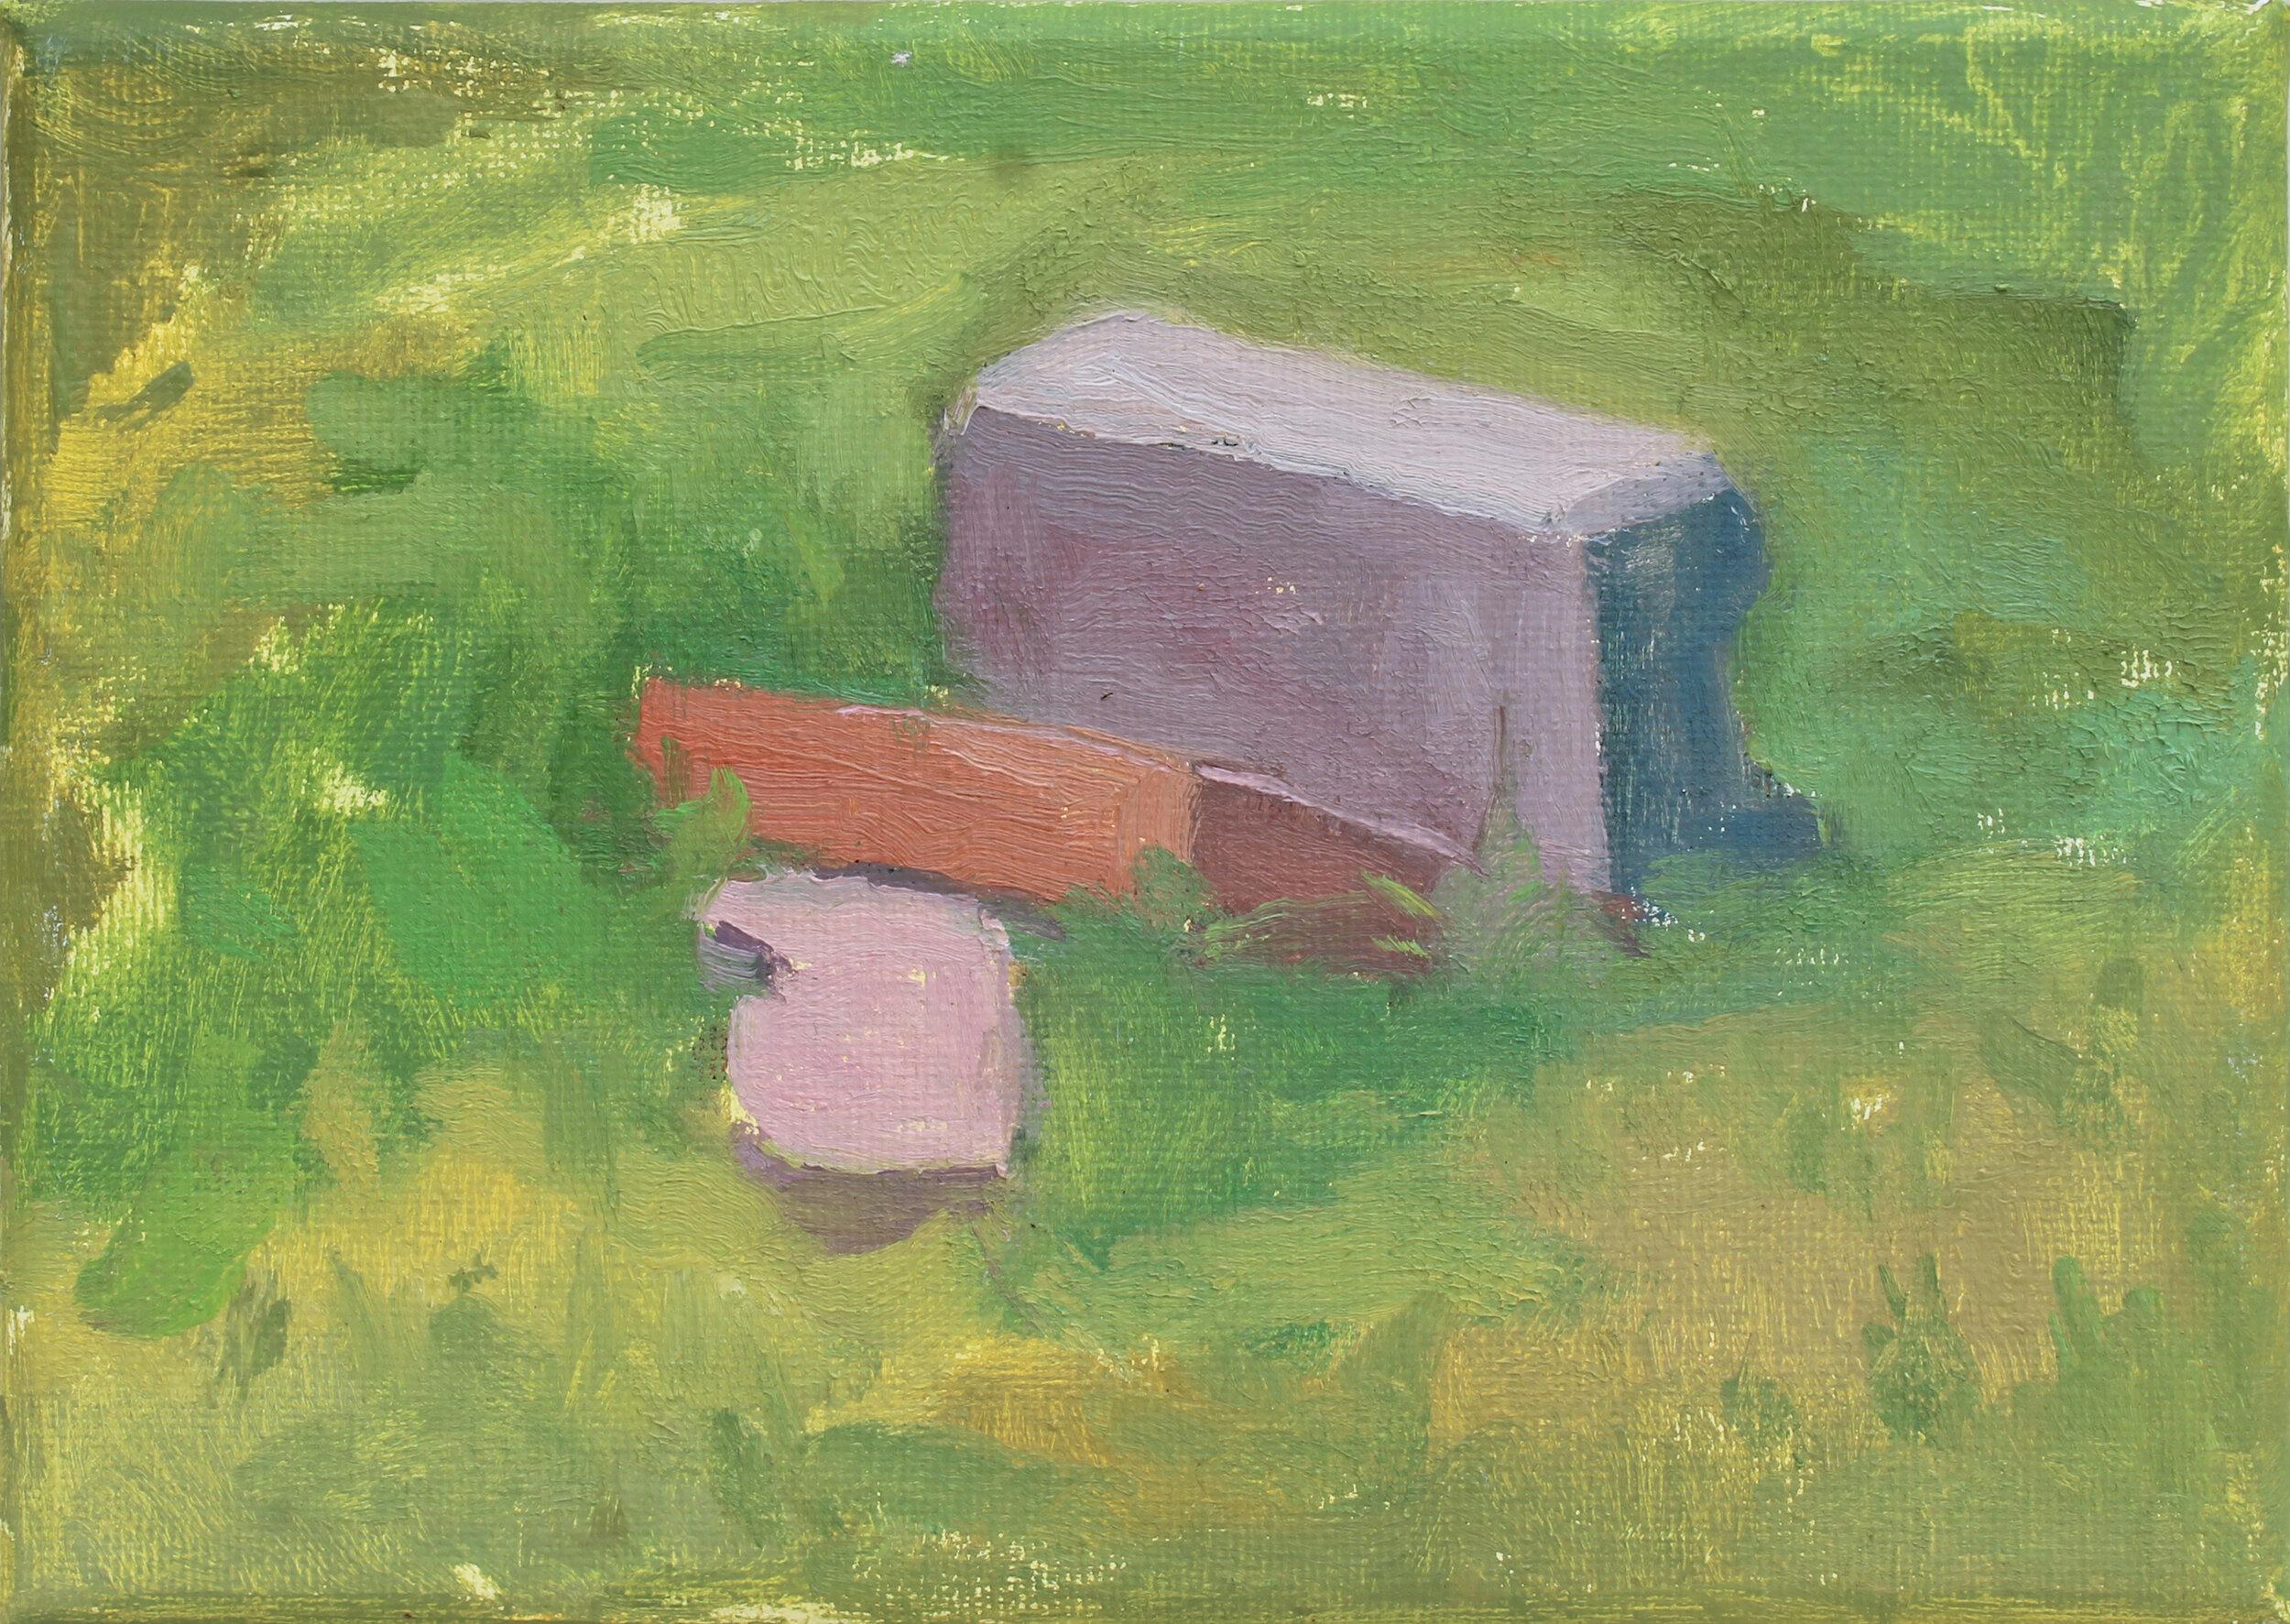 "Summer Grass, Three Bricks  oil on canvas 5x7"" 2019   available"